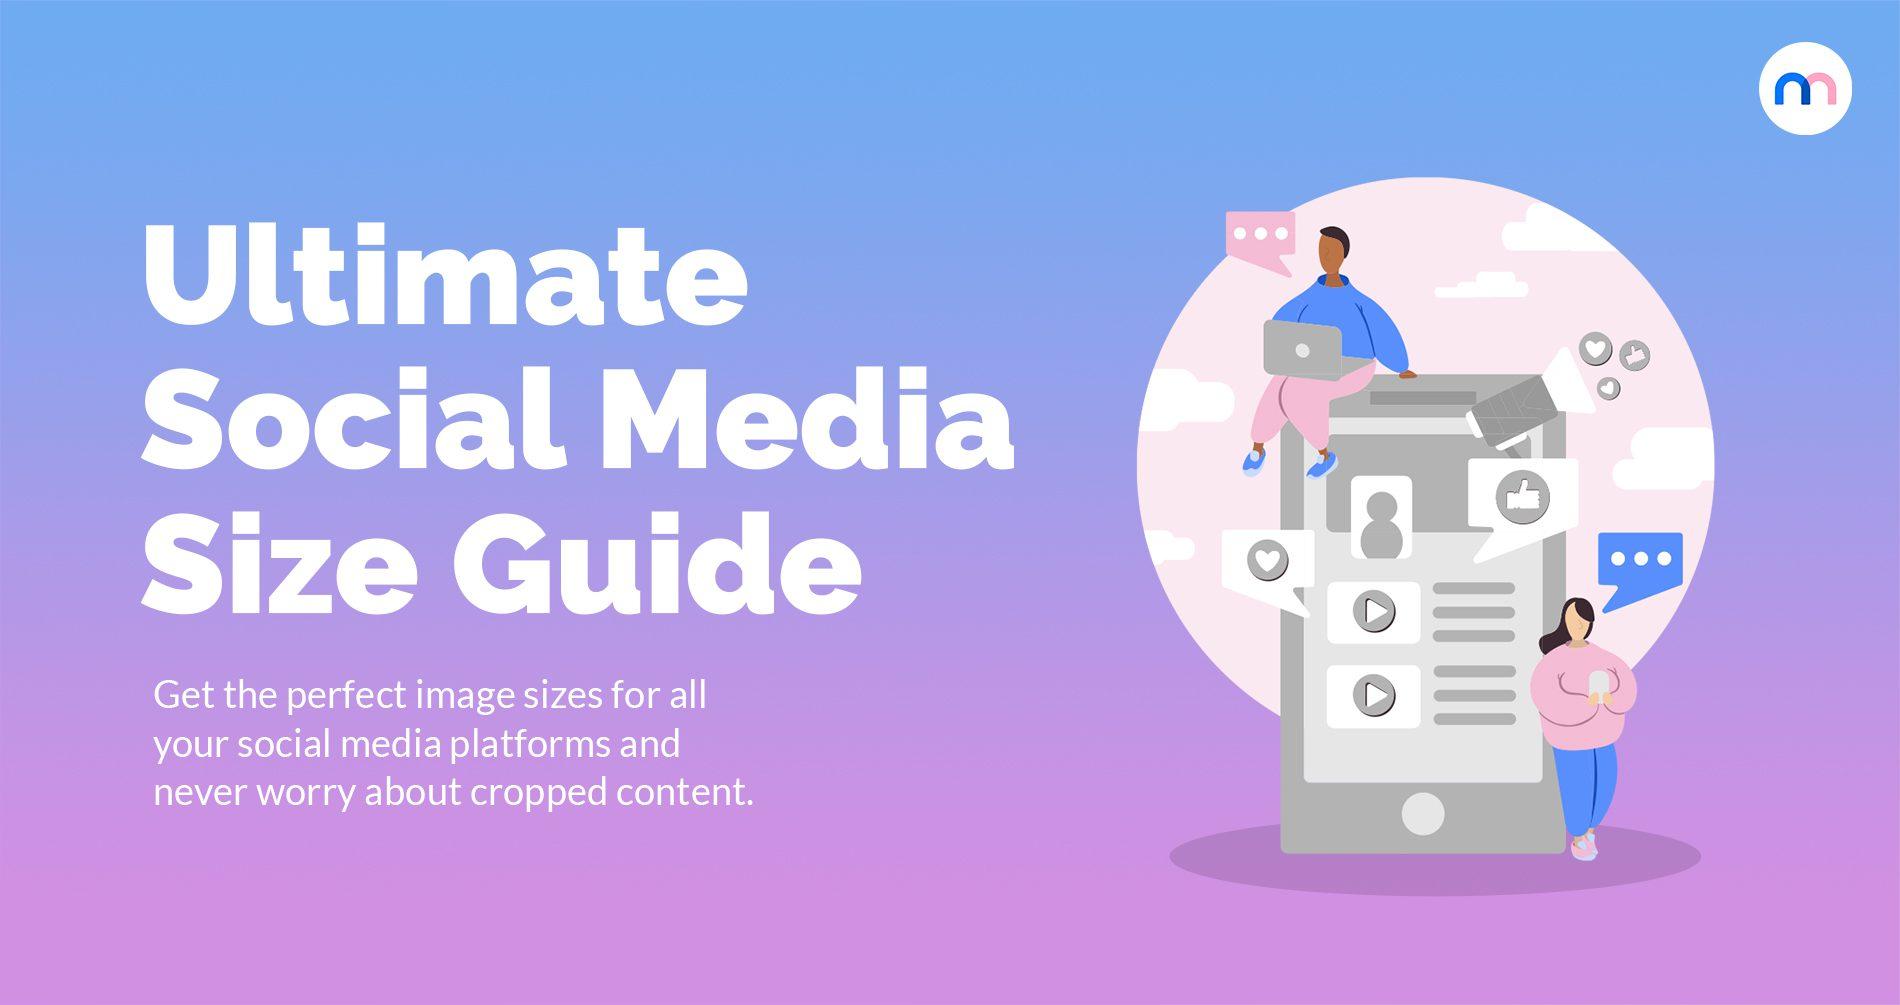 01-ultimate-social-media-image-size-guide-2